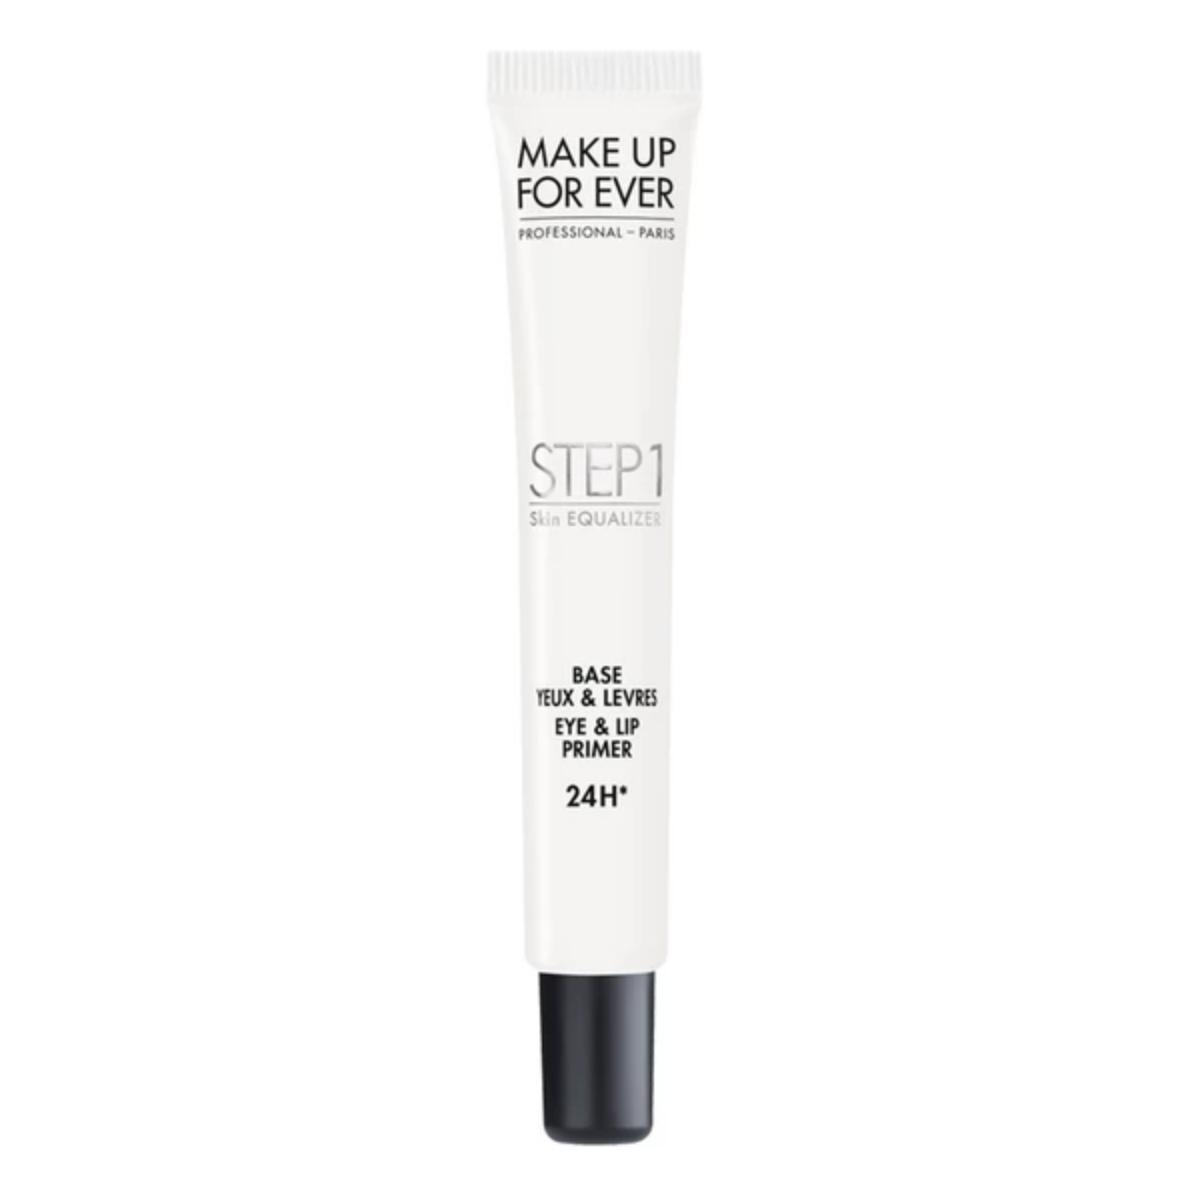 Makeup Forever Step 1 Skin Equalizer Eye & Lip Primer Mini 1.5ml